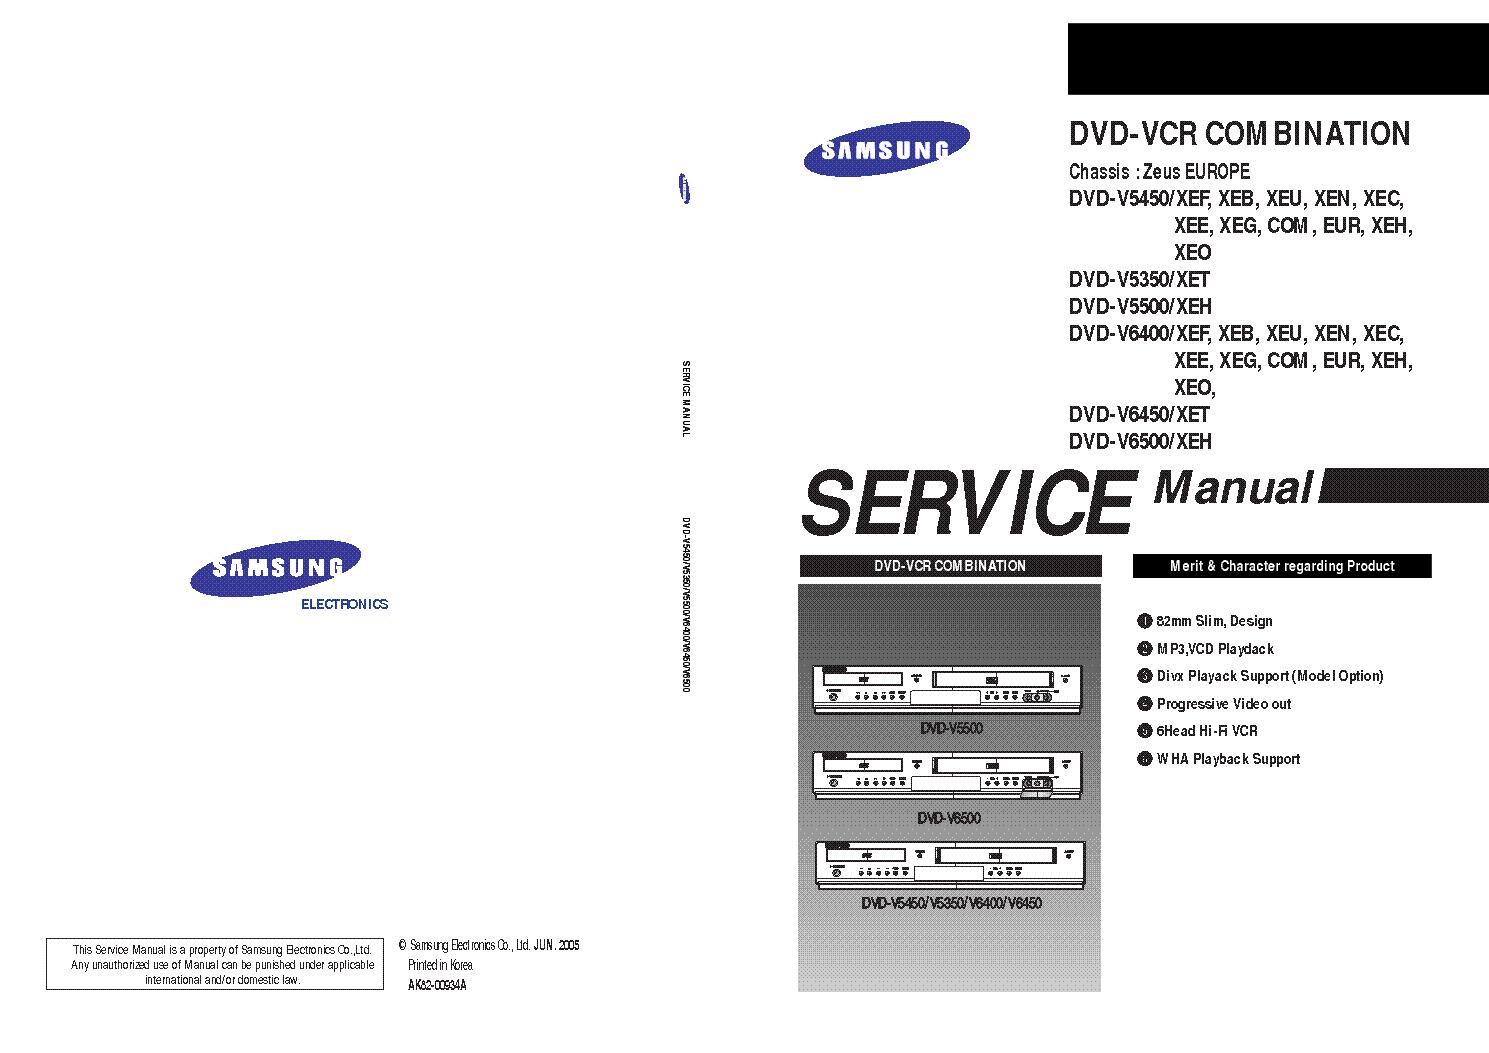 samsung dvd v5450 v5350 v5500 v6400 v6450 v6500 sm service manual rh elektrotanya com samsung 5500 manual series 5 samsung v5500 manual